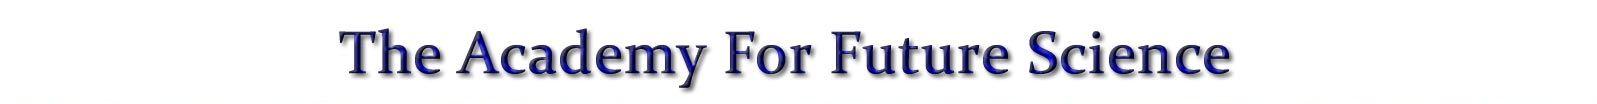 AFFS Africa Logo